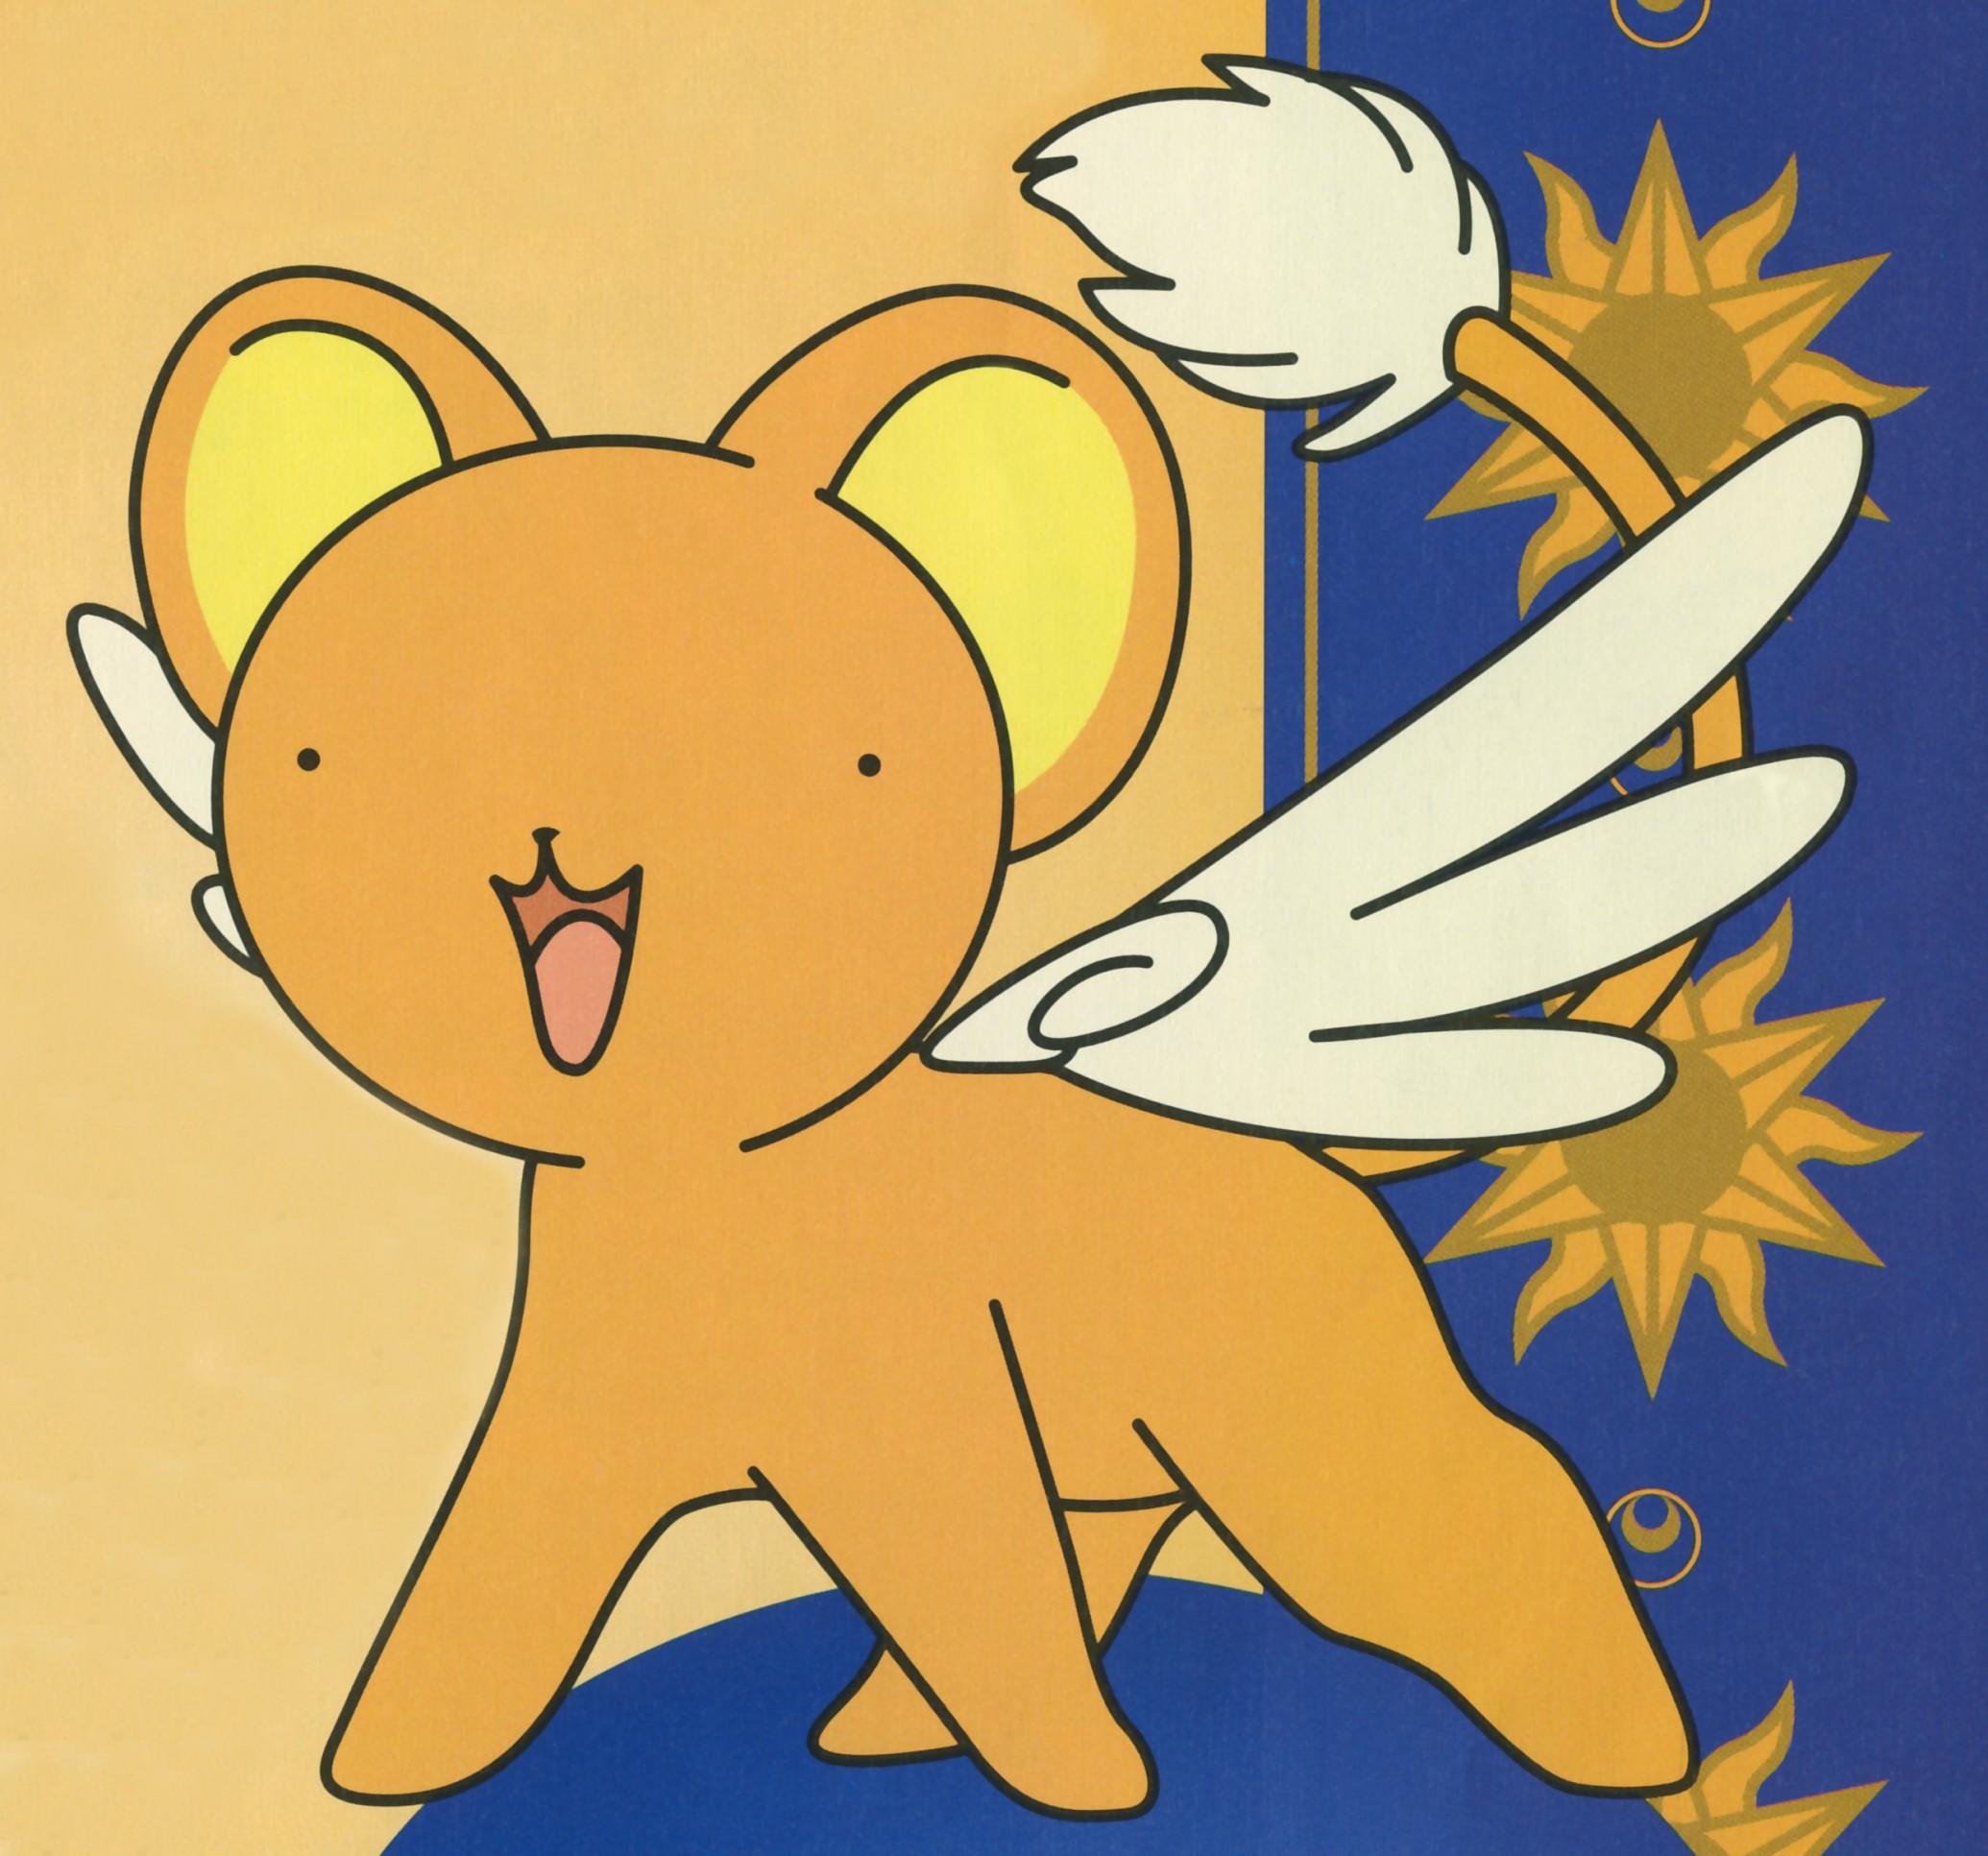 Cardcaptor Sakura Kero-chan